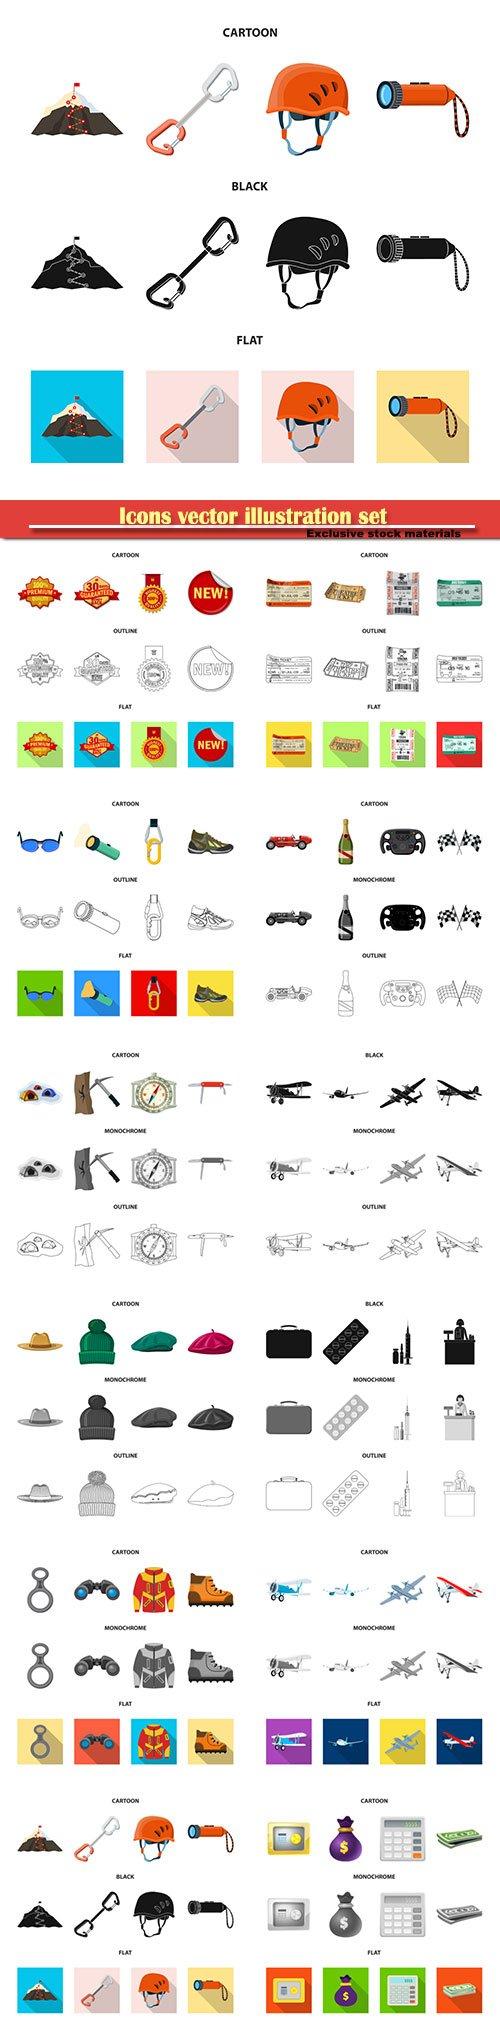 Icons vector illustration set # 10